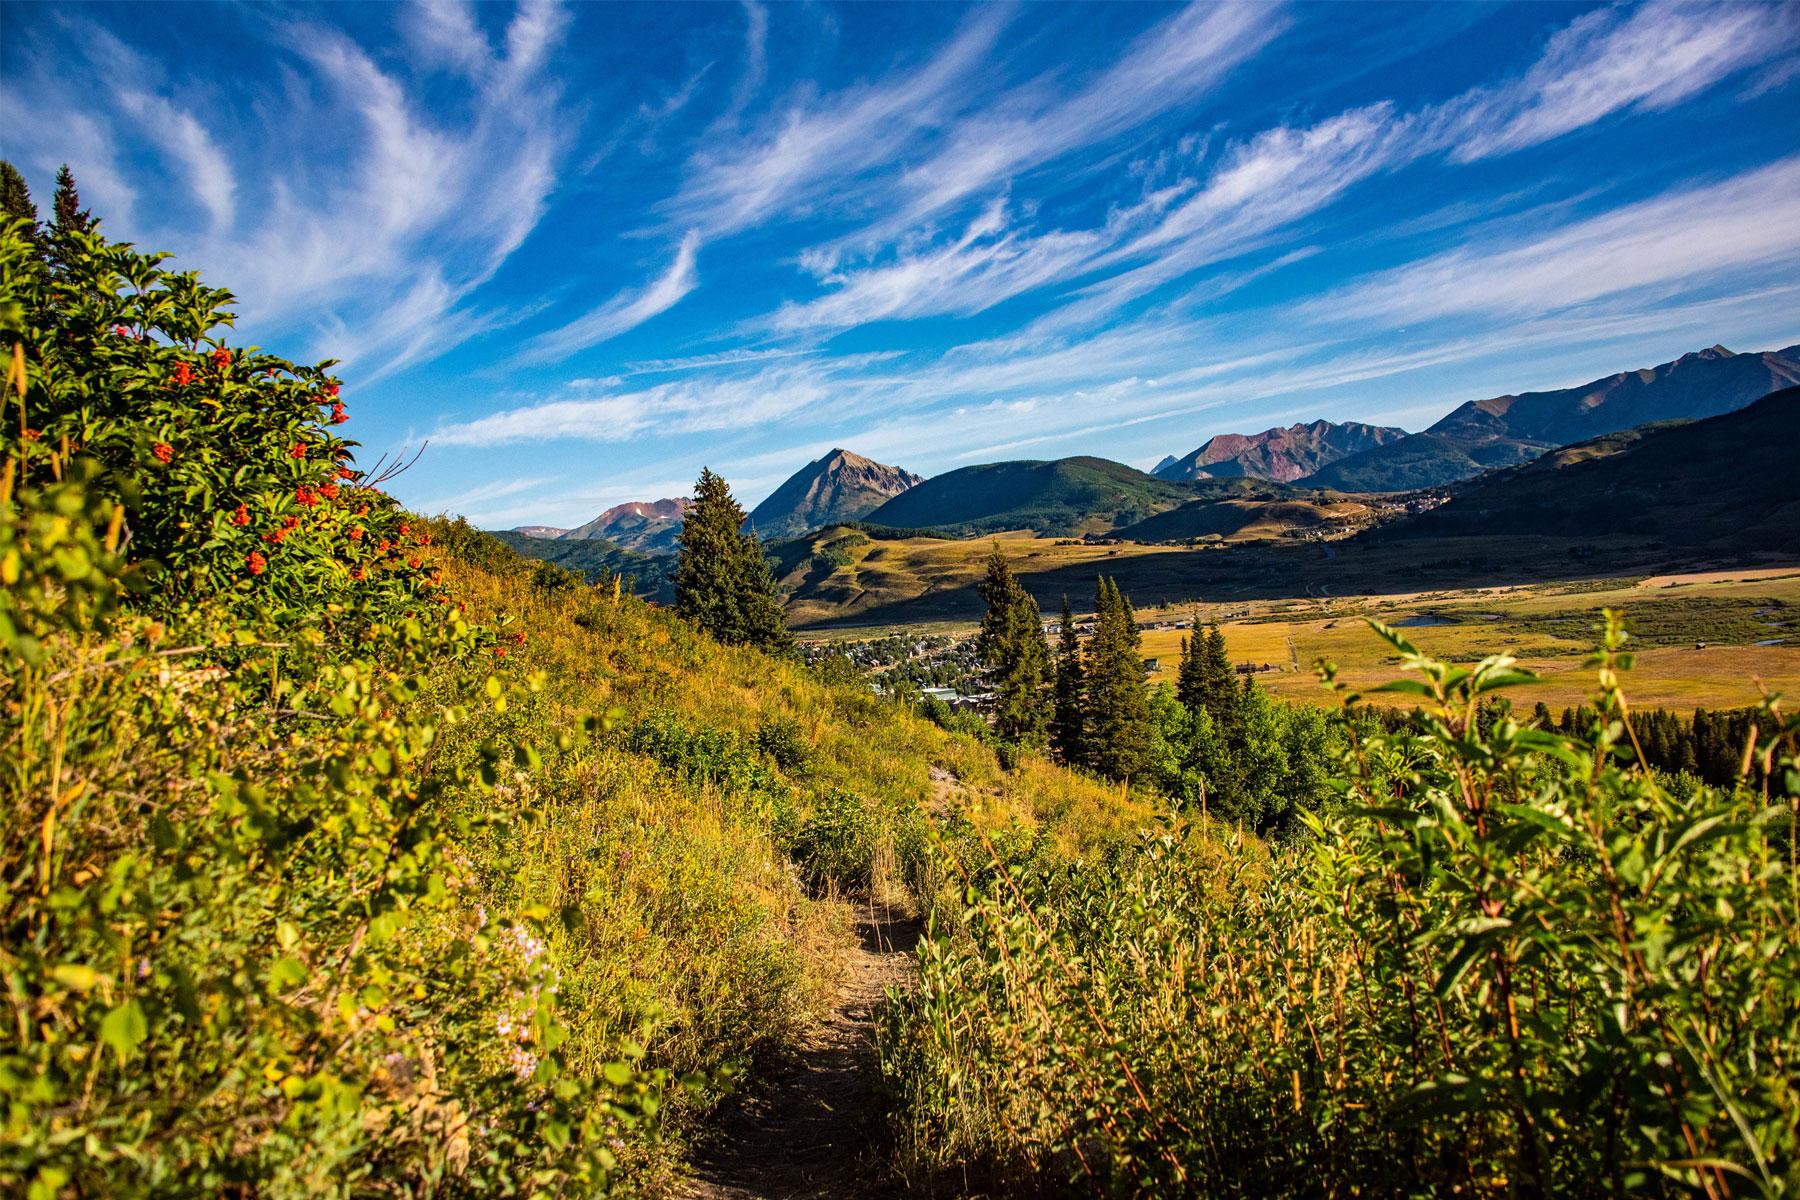 Gunnison-Crested Butte